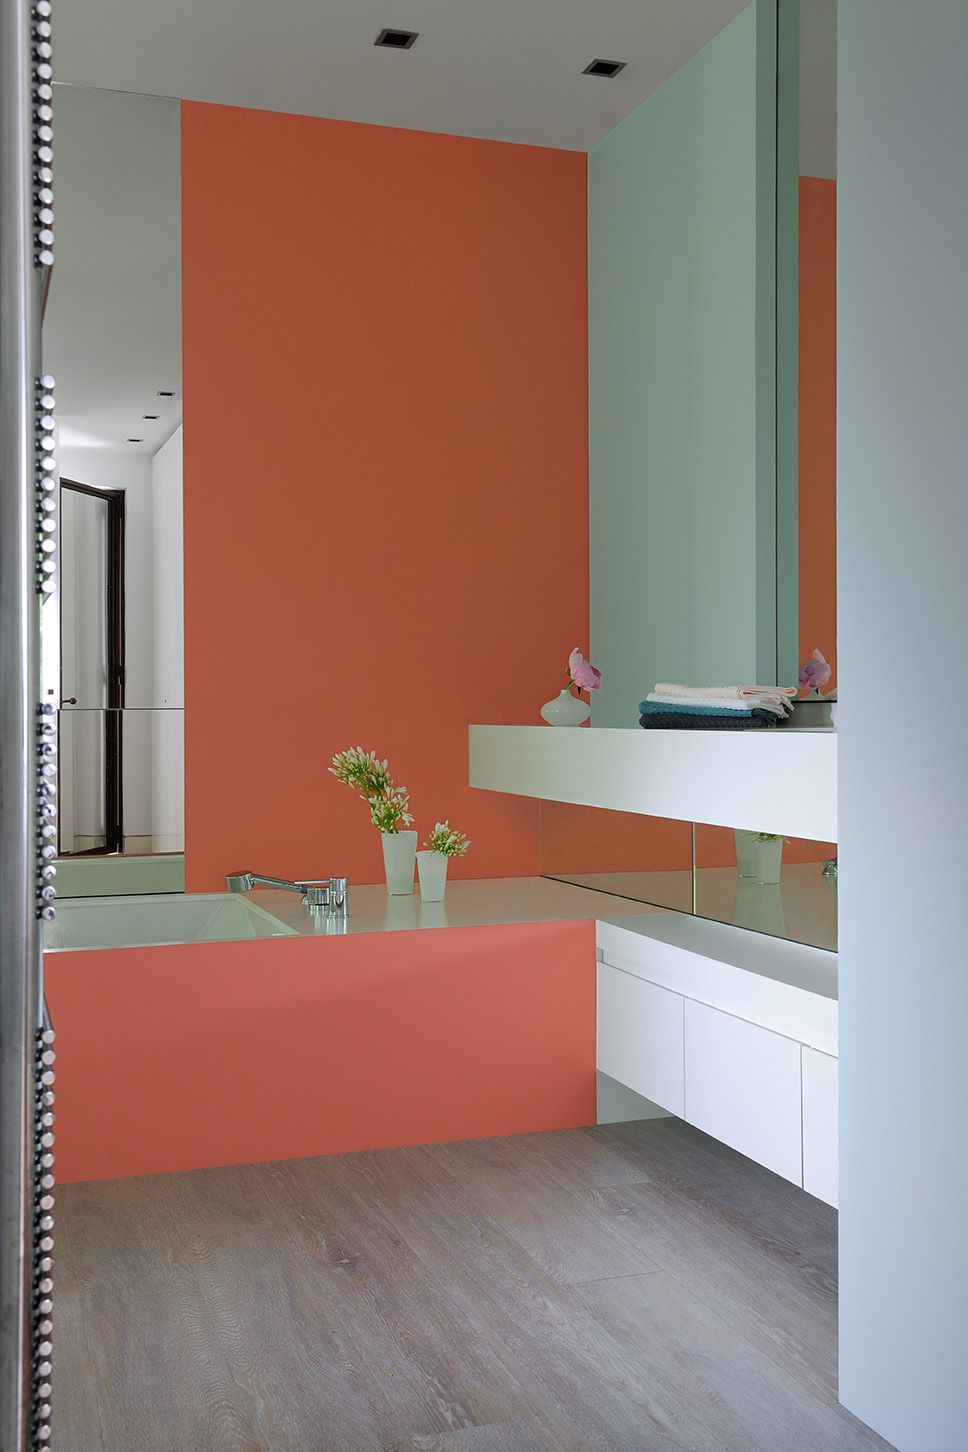 Du Peps Dans La Salle De Bains Peinture Zolpan Orange Vert